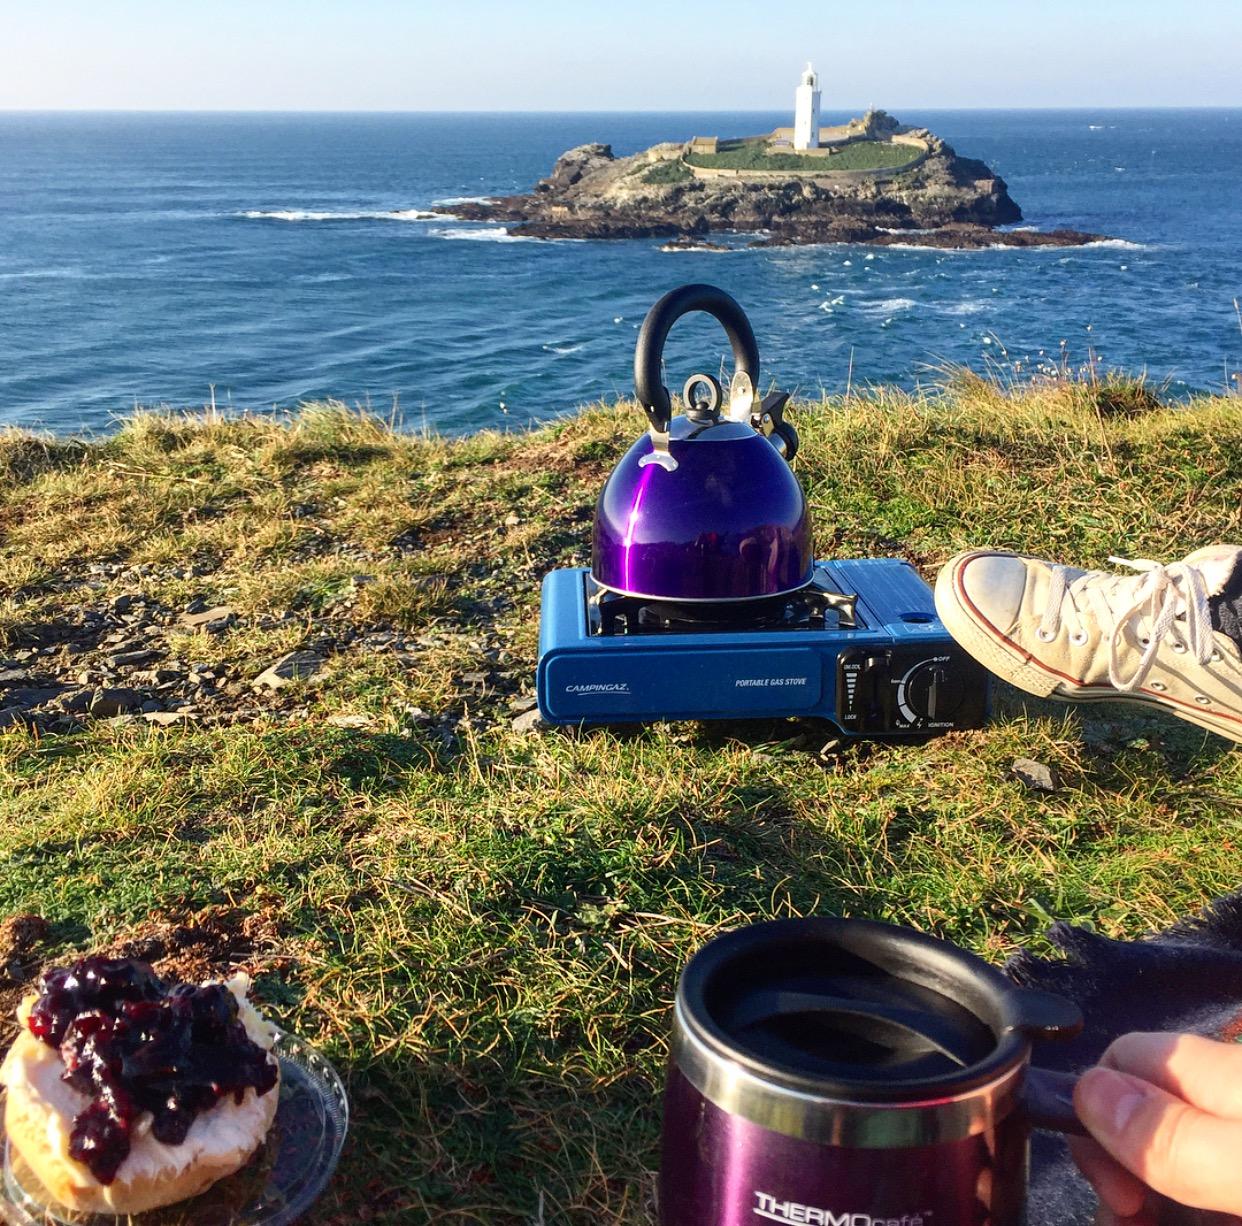 Tea and clotted cream scone with black cherry jam